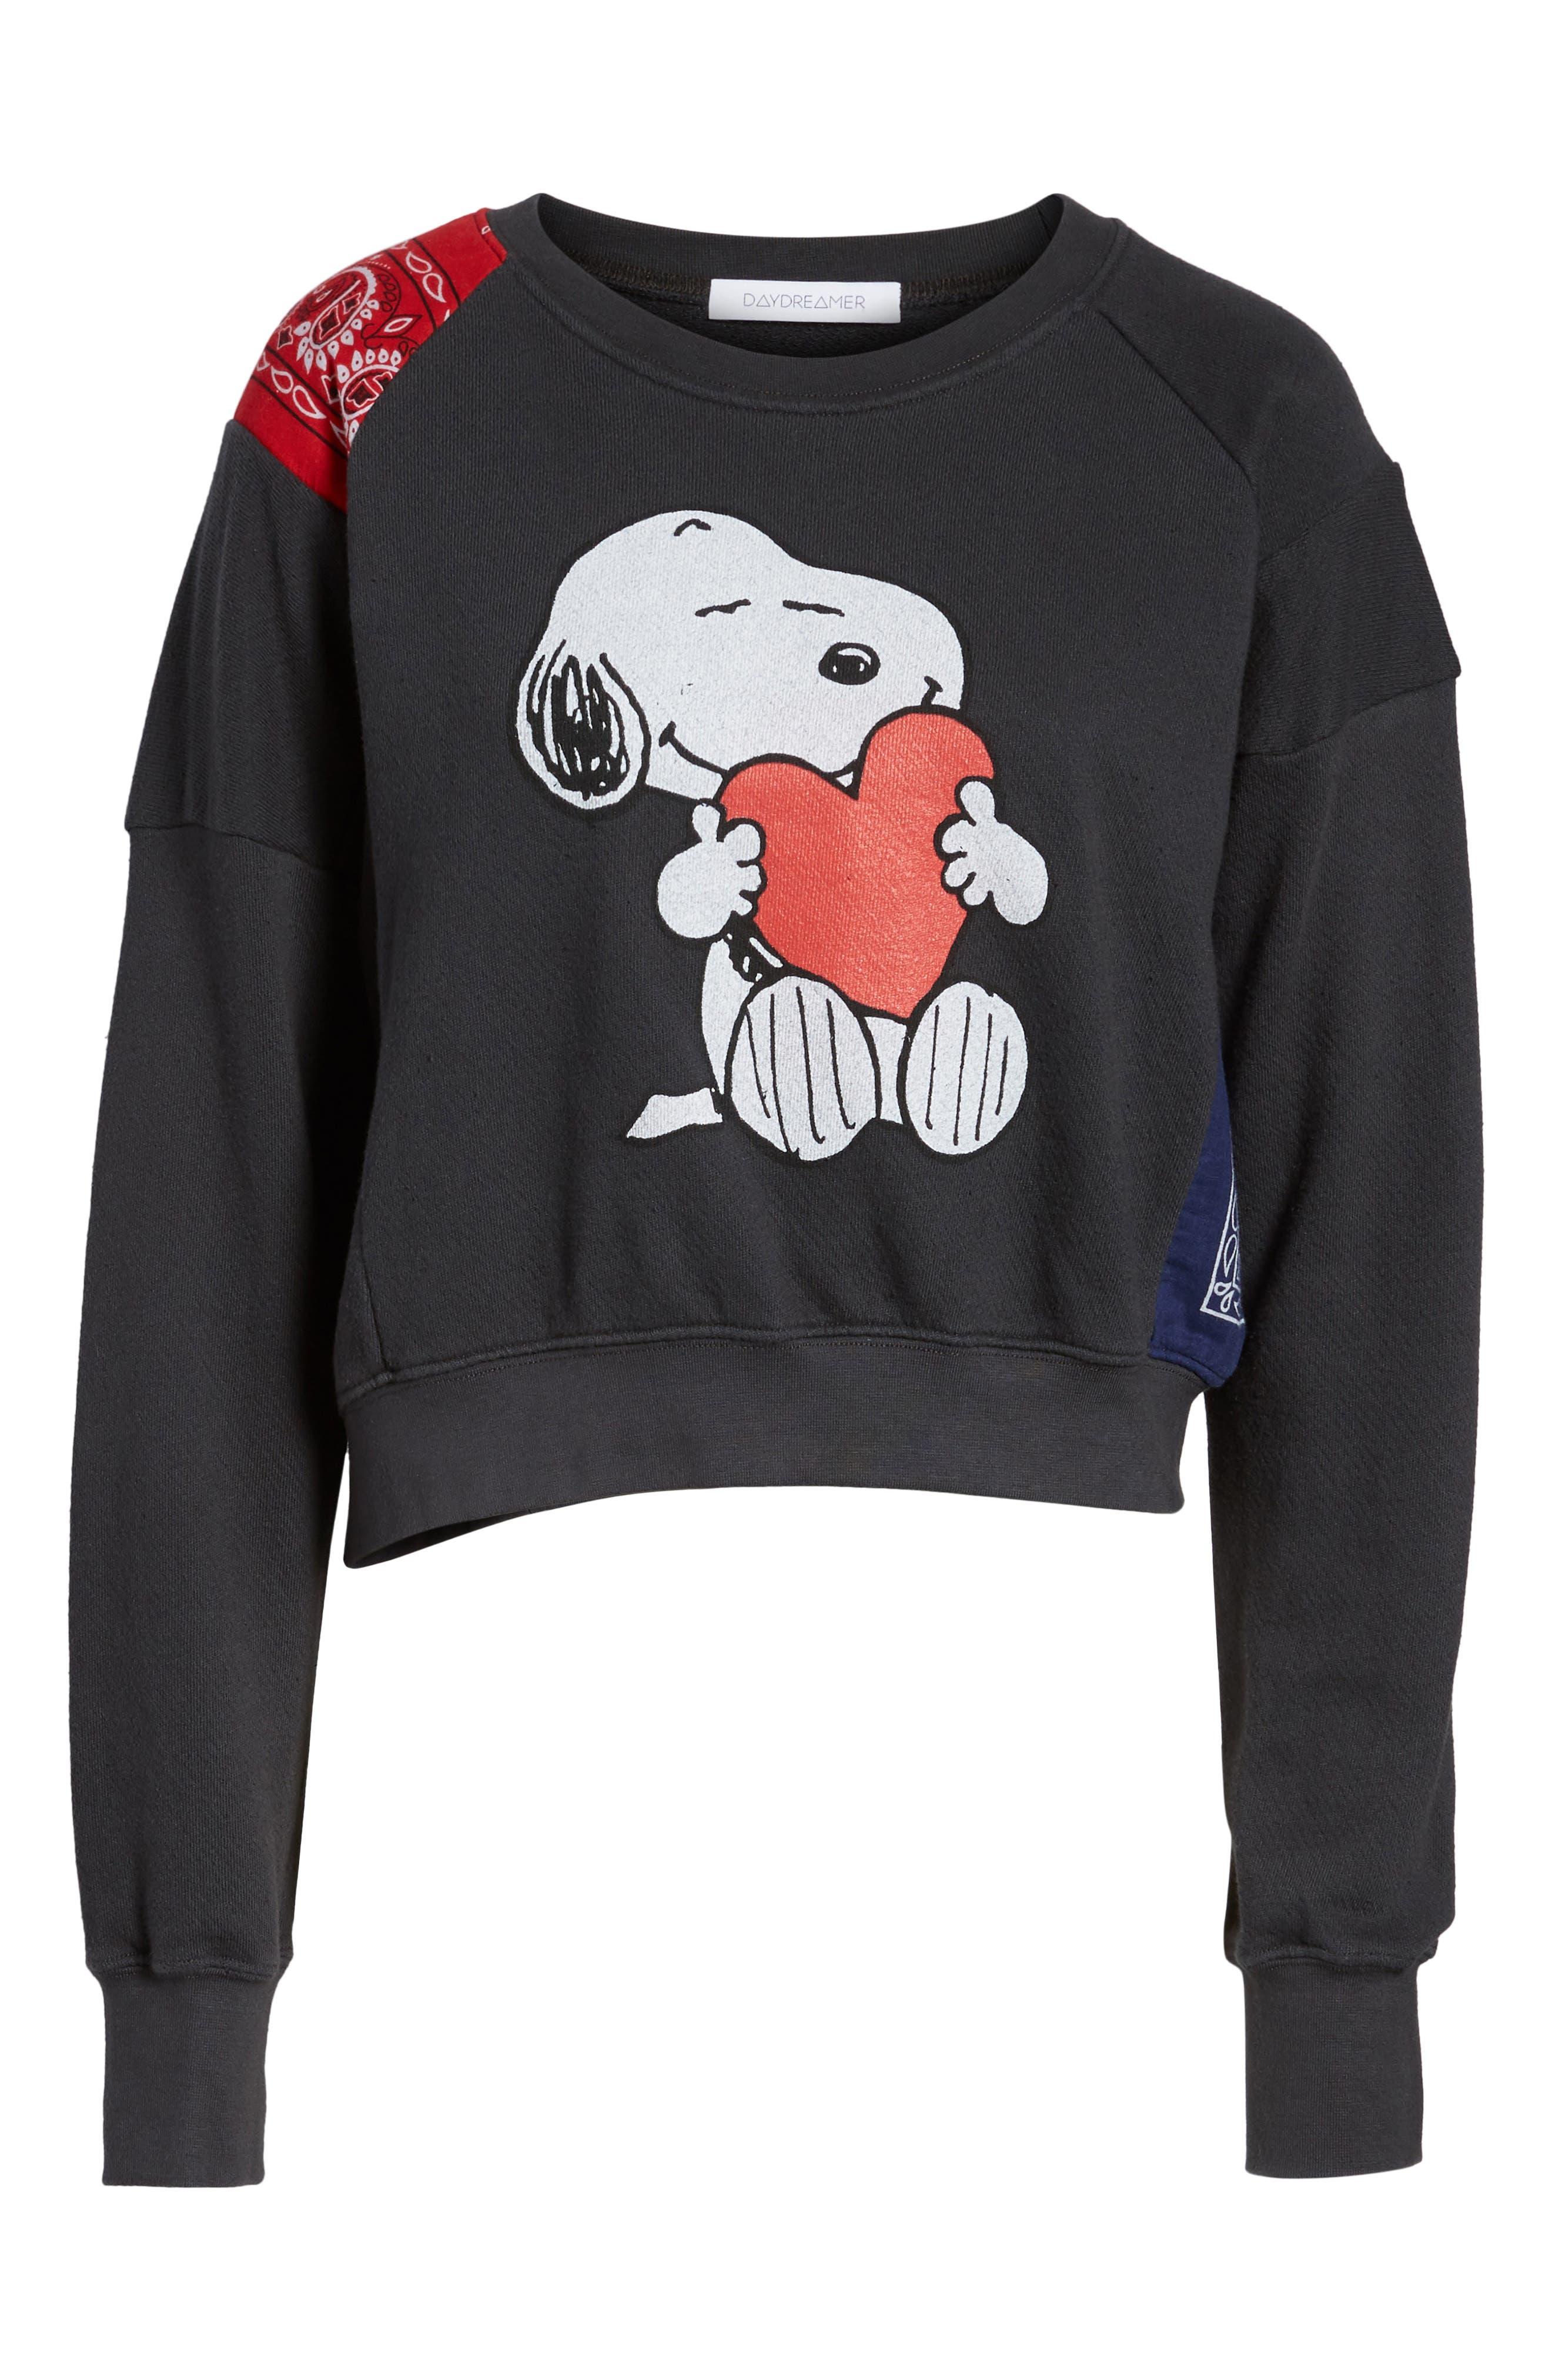 Main Image - Daydreamer Snoopy Bandana Panel Sweatshirt (Limited Edition) (Nordstrom Exclusive)